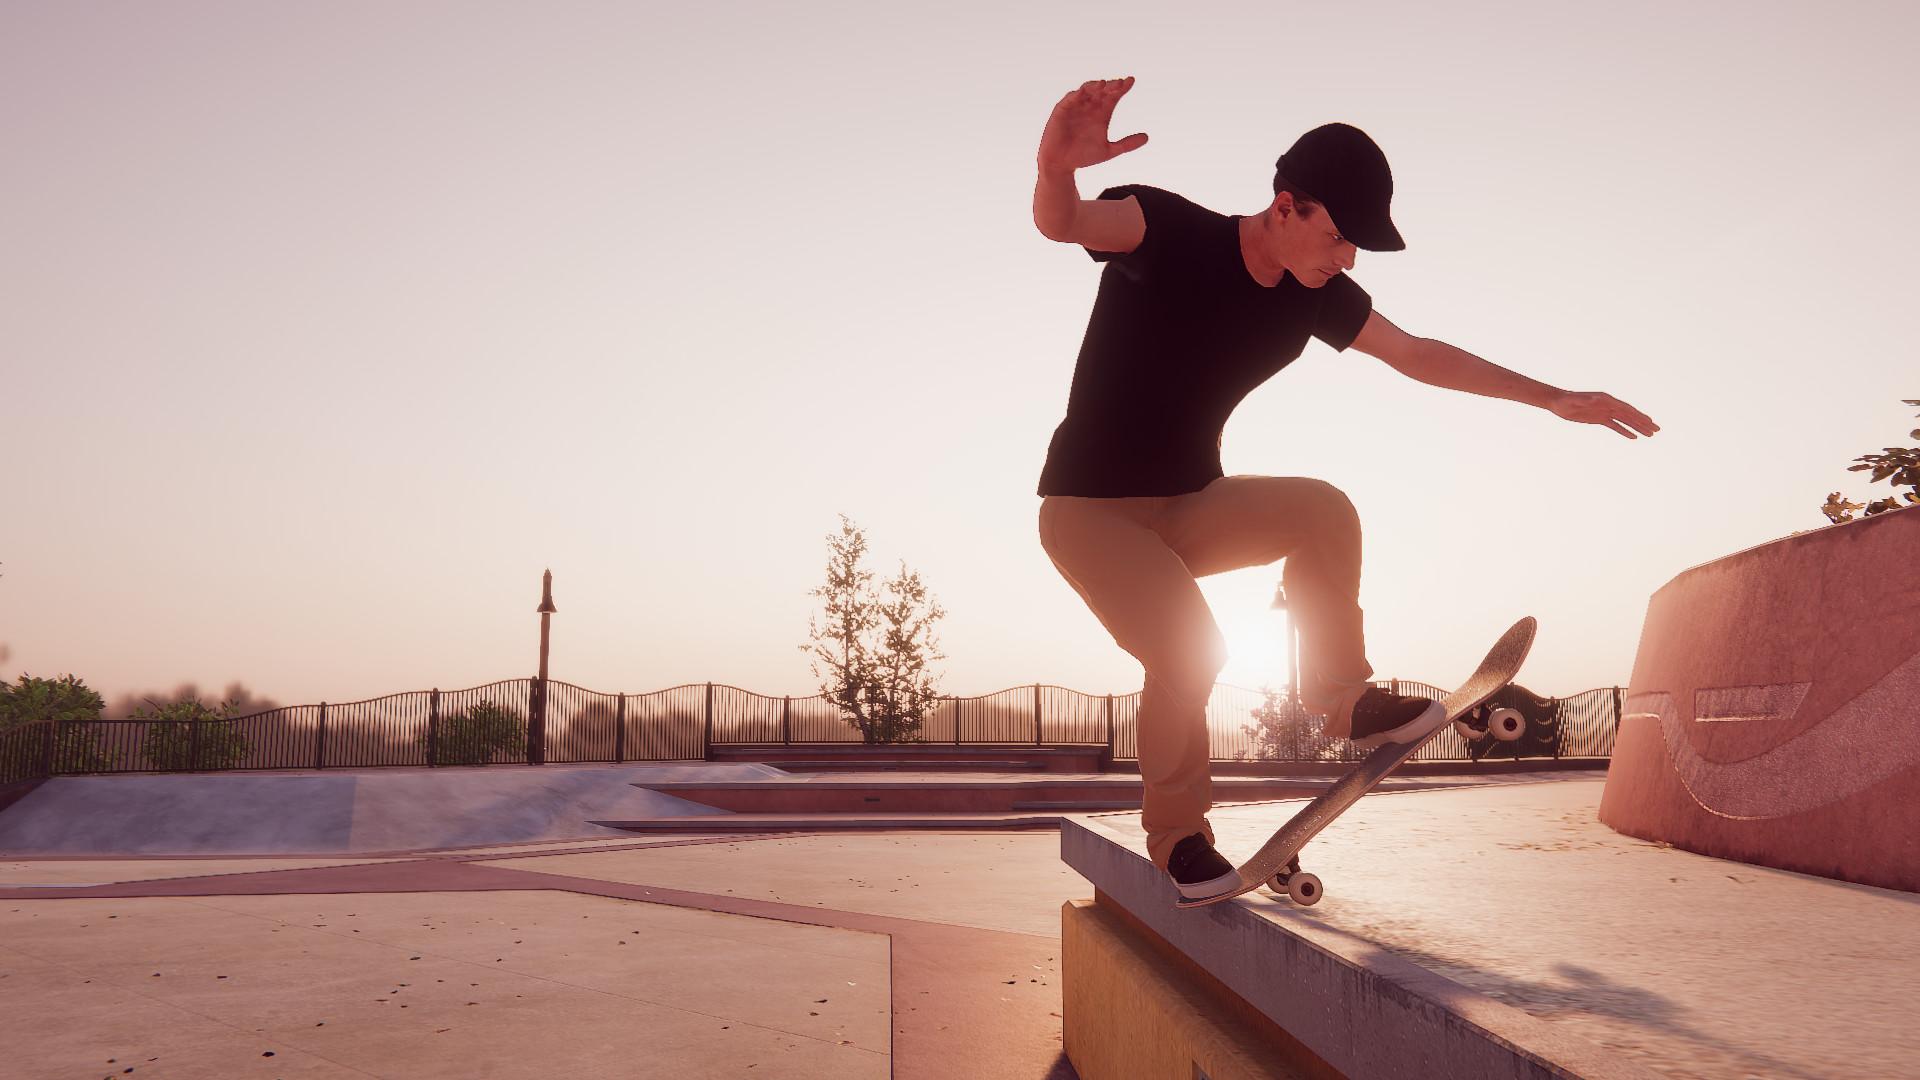 skate dating site